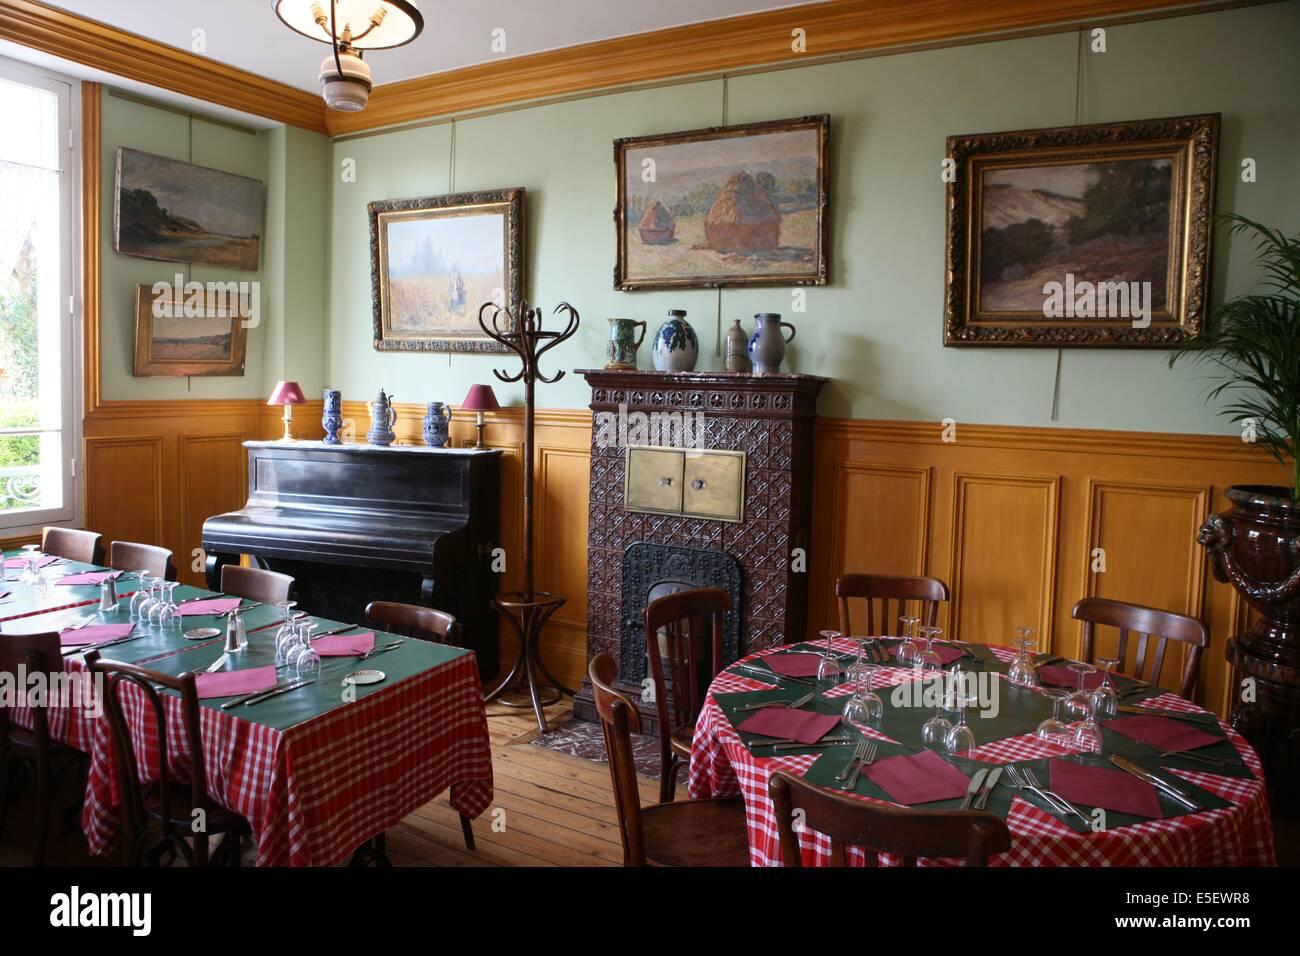 Monet Zimmer Stockfotos & Monet Zimmer Bilder - Alamy